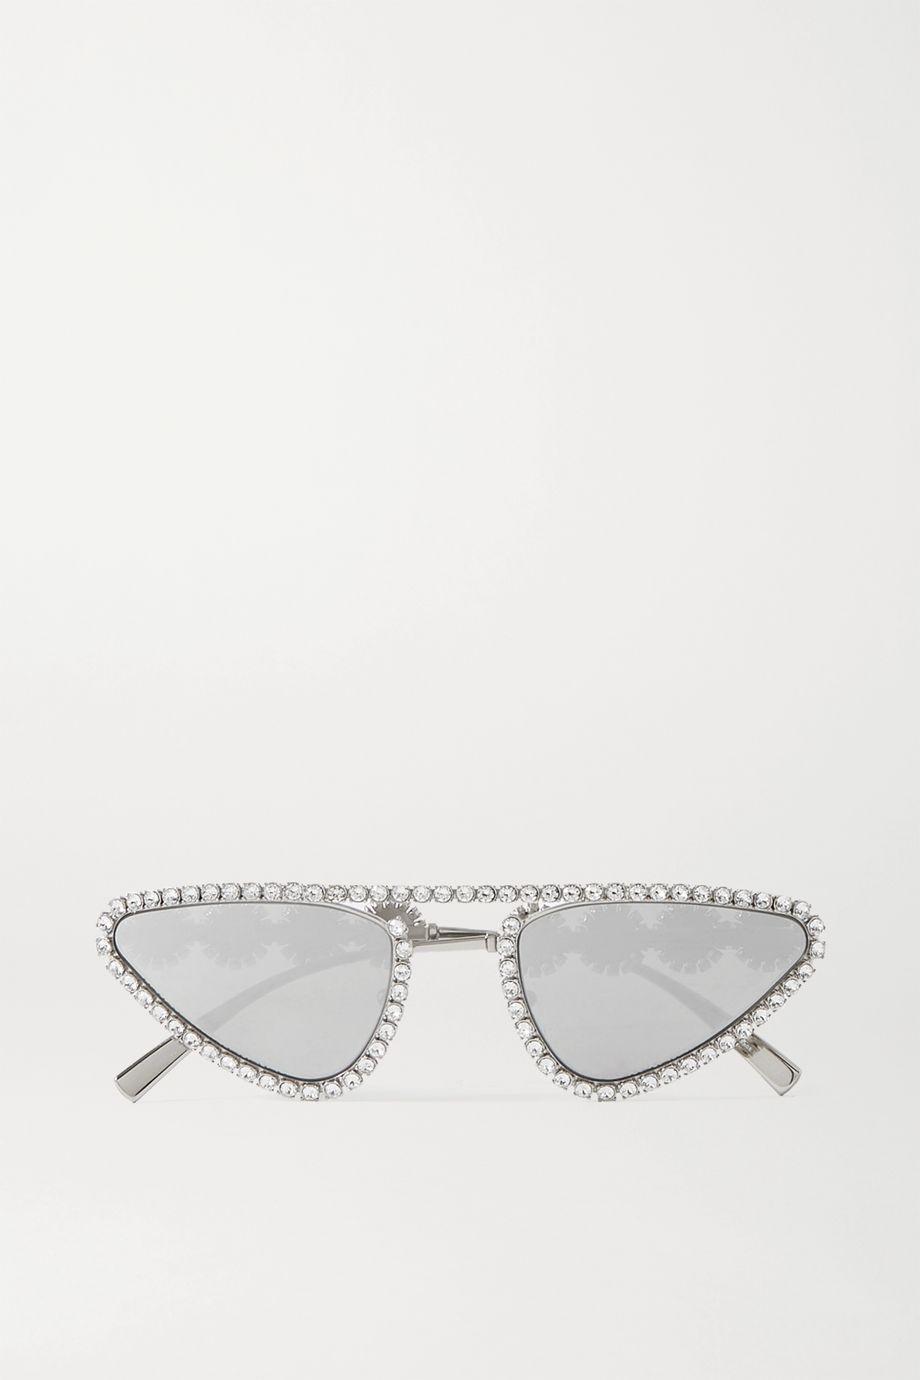 Versace Cat-eye Swarovski crystal-embellished silver-tone mirrored sunglasses